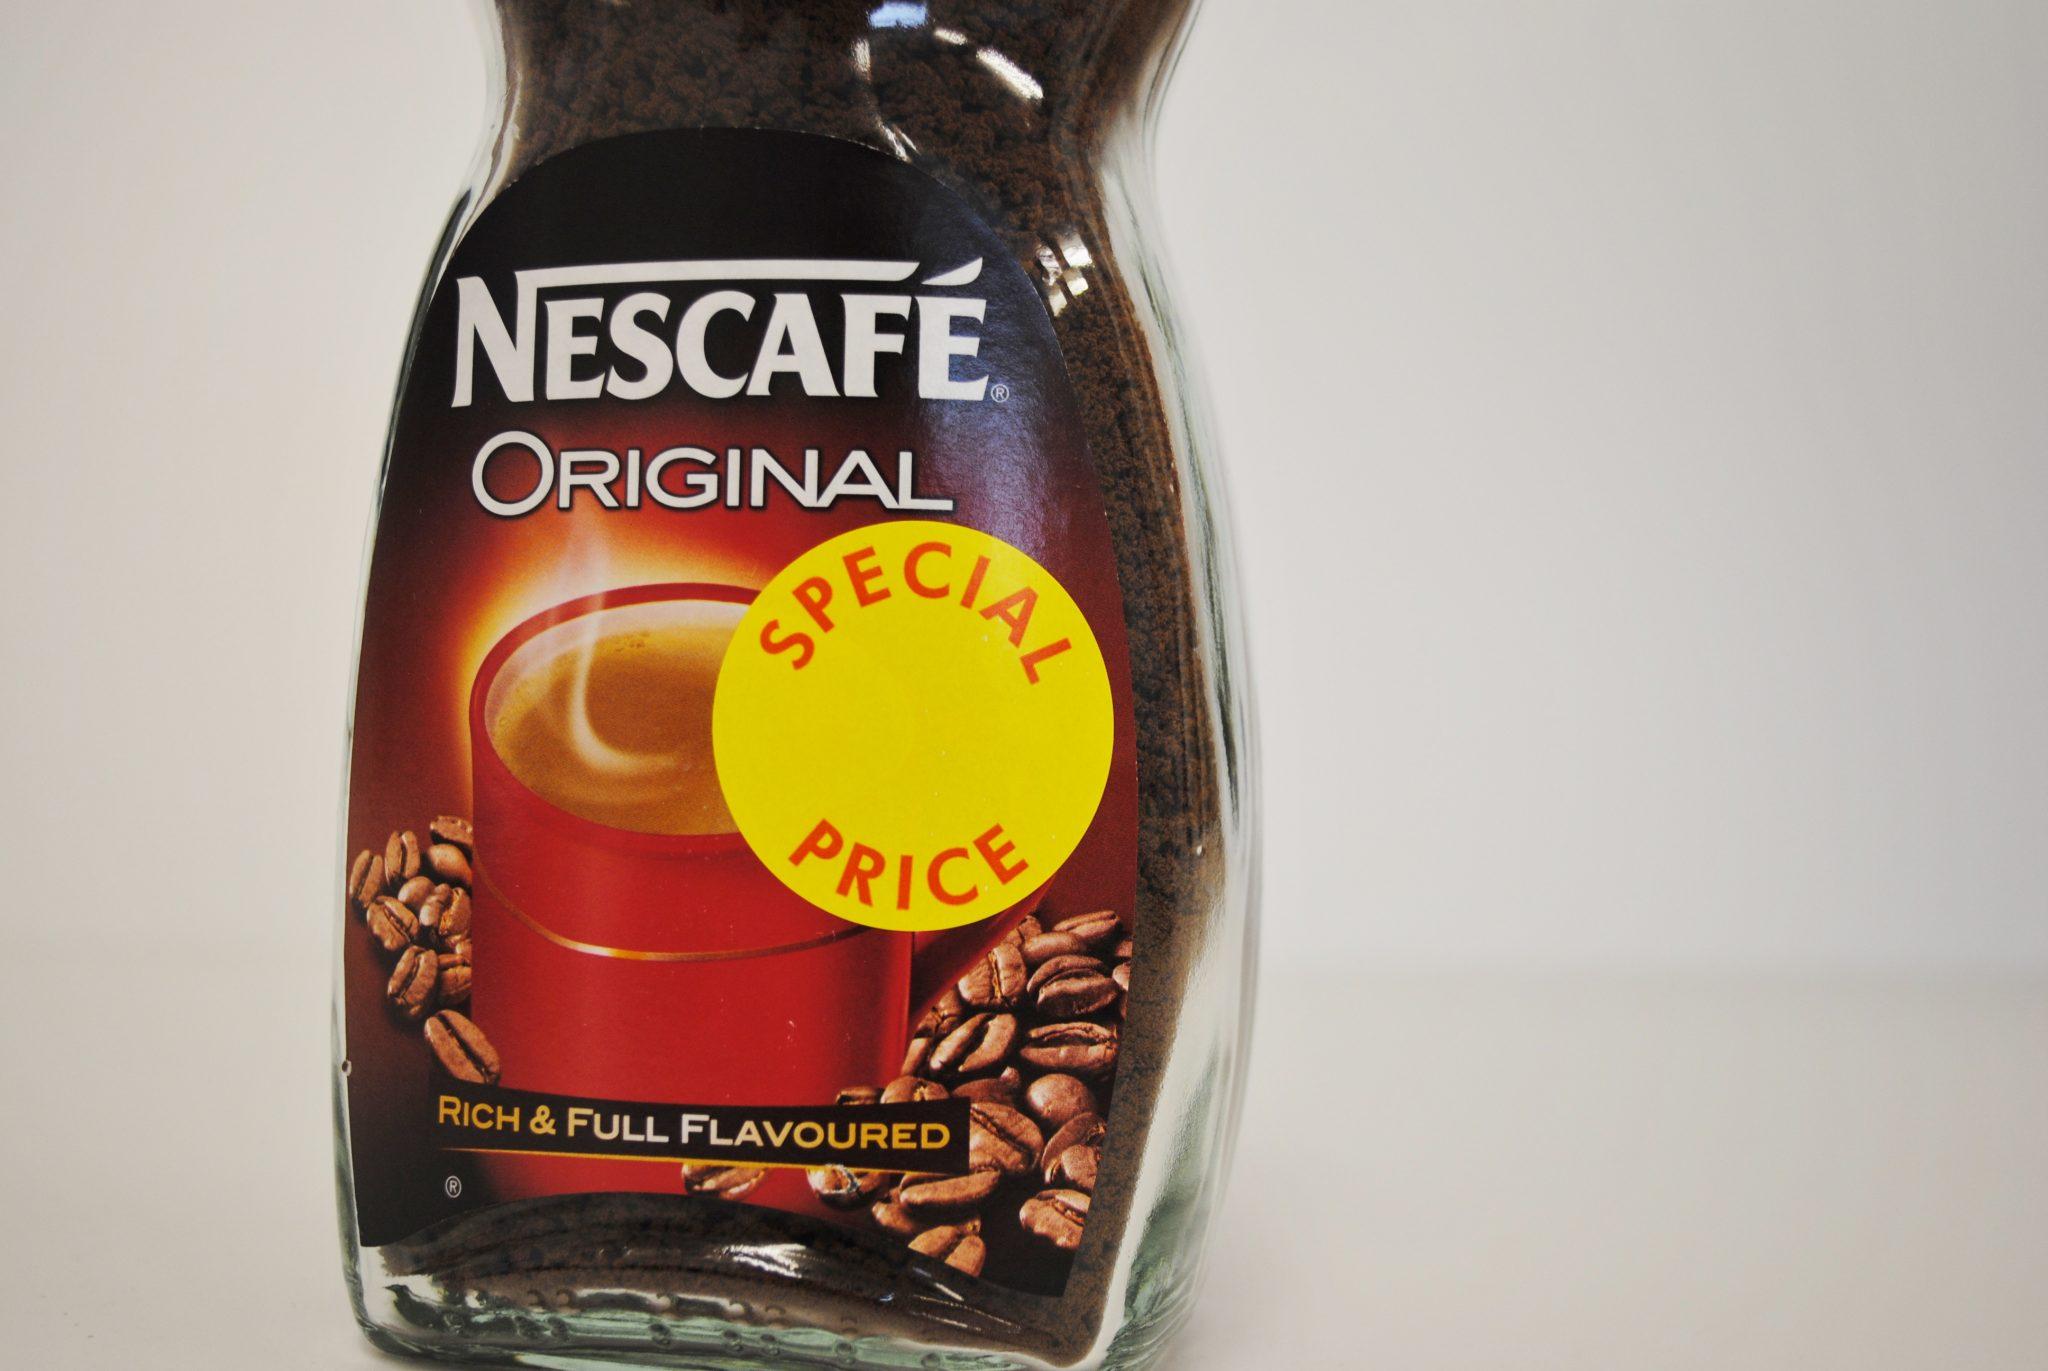 Special Price Circular Label